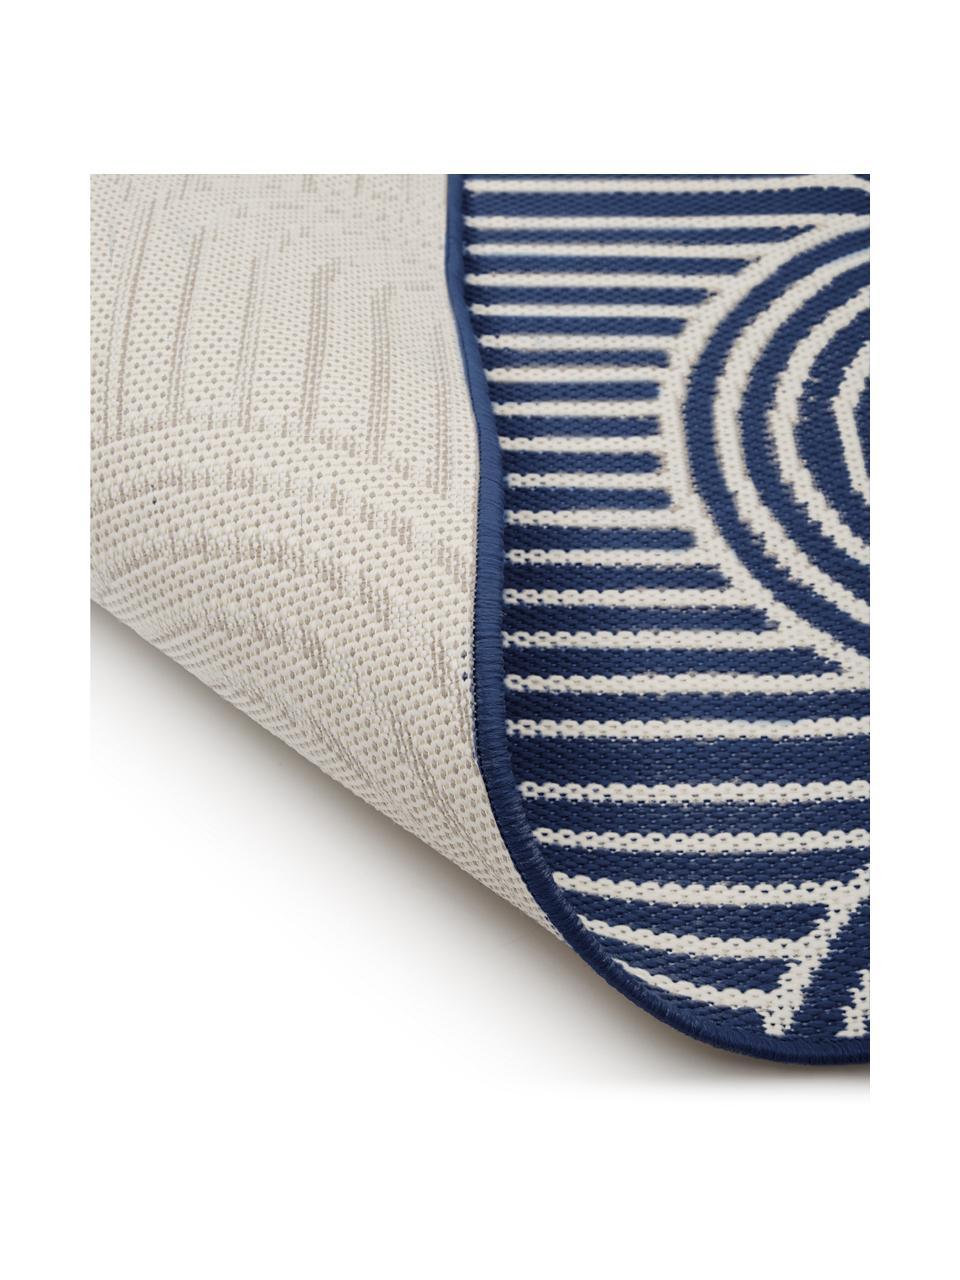 Passatoia da interno-esterno blu/bianco crema Arches, 86% polipropilene, 14% poliestere, Blu, bianco, Larg. 80 x Lung. 250 cm